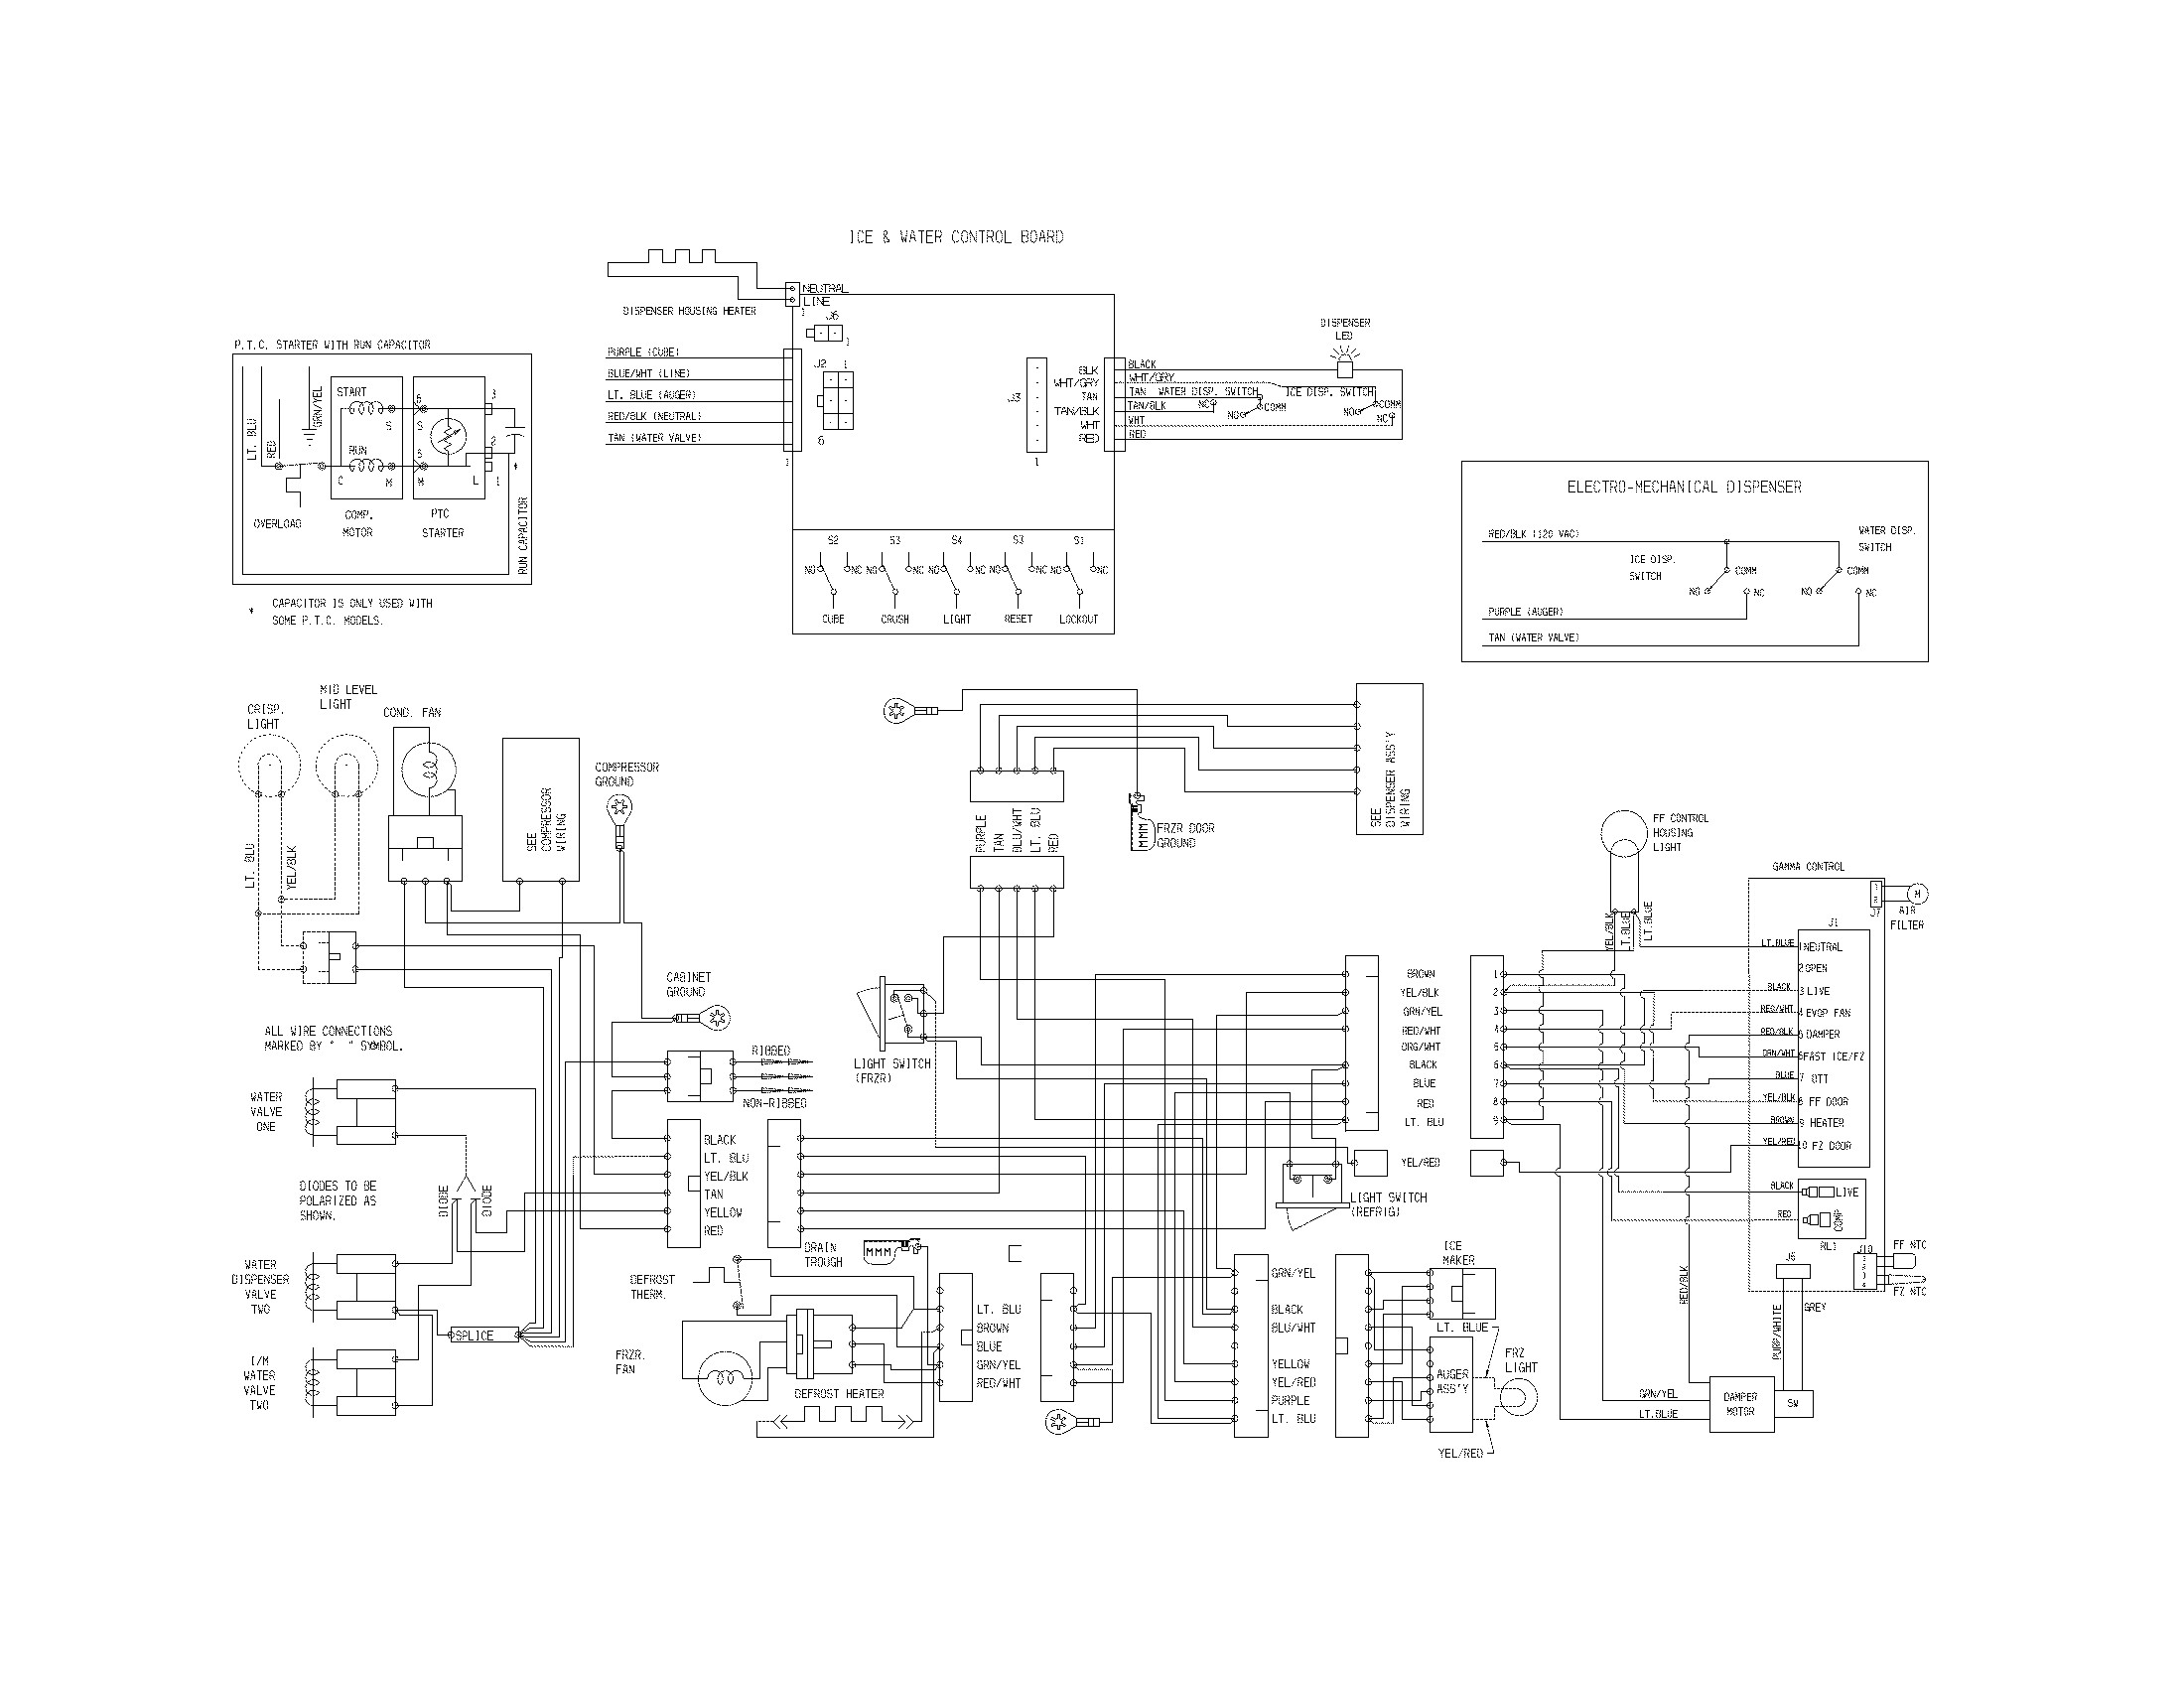 frigidaire refrigerator wiring diagram unique